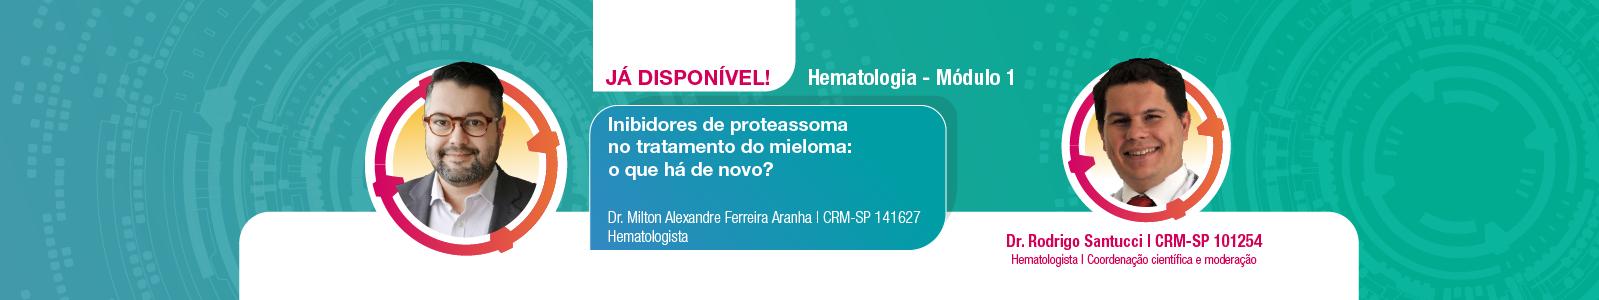 Aulas-banners-hematologia-Módulo 1-disponível